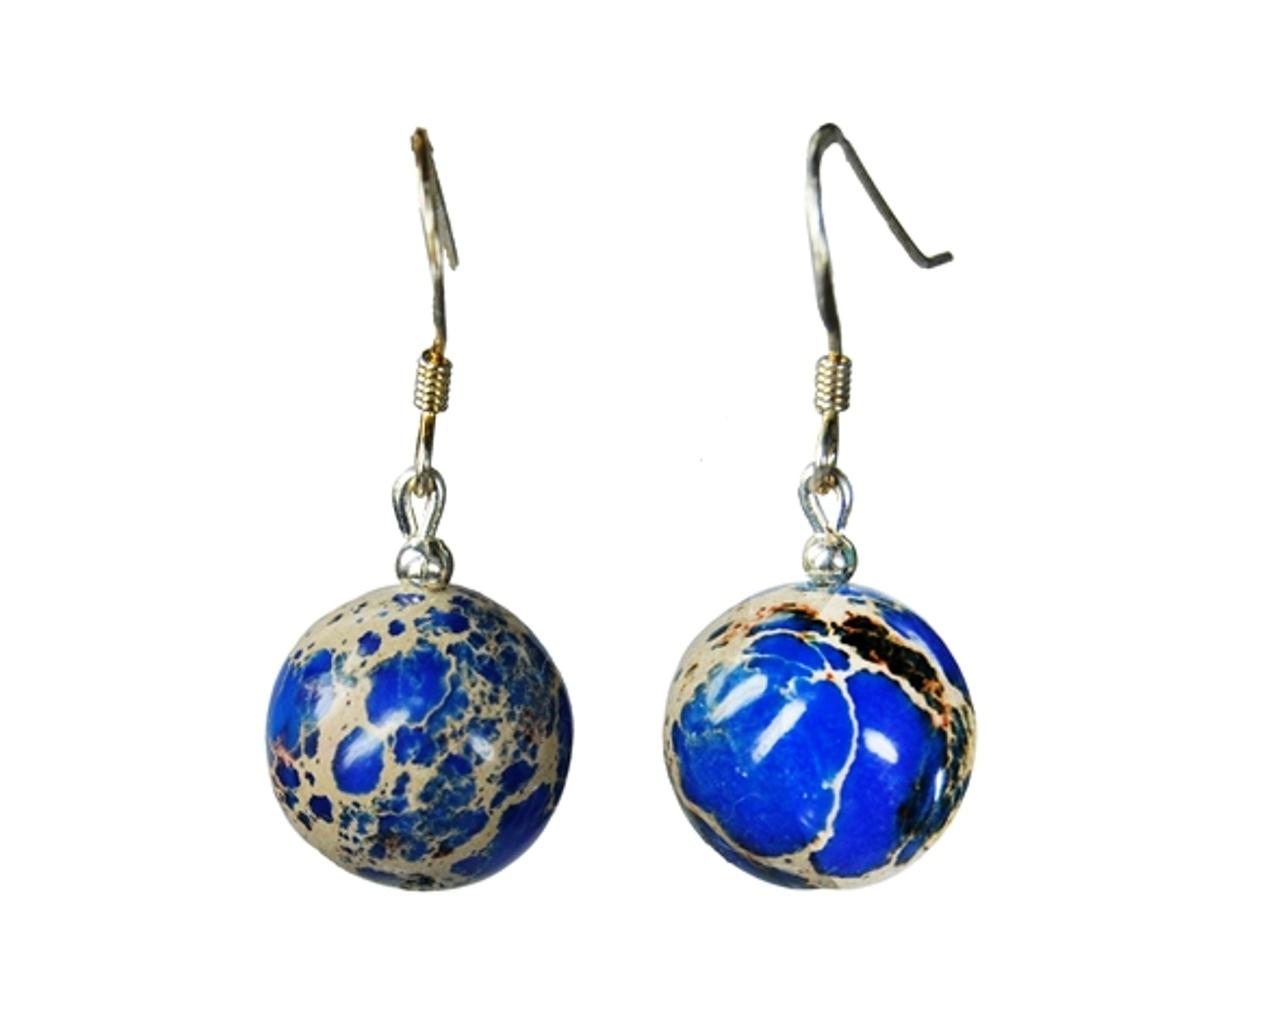 Blue Sea Sediment Jasper Dangle Earrings 35x10mm